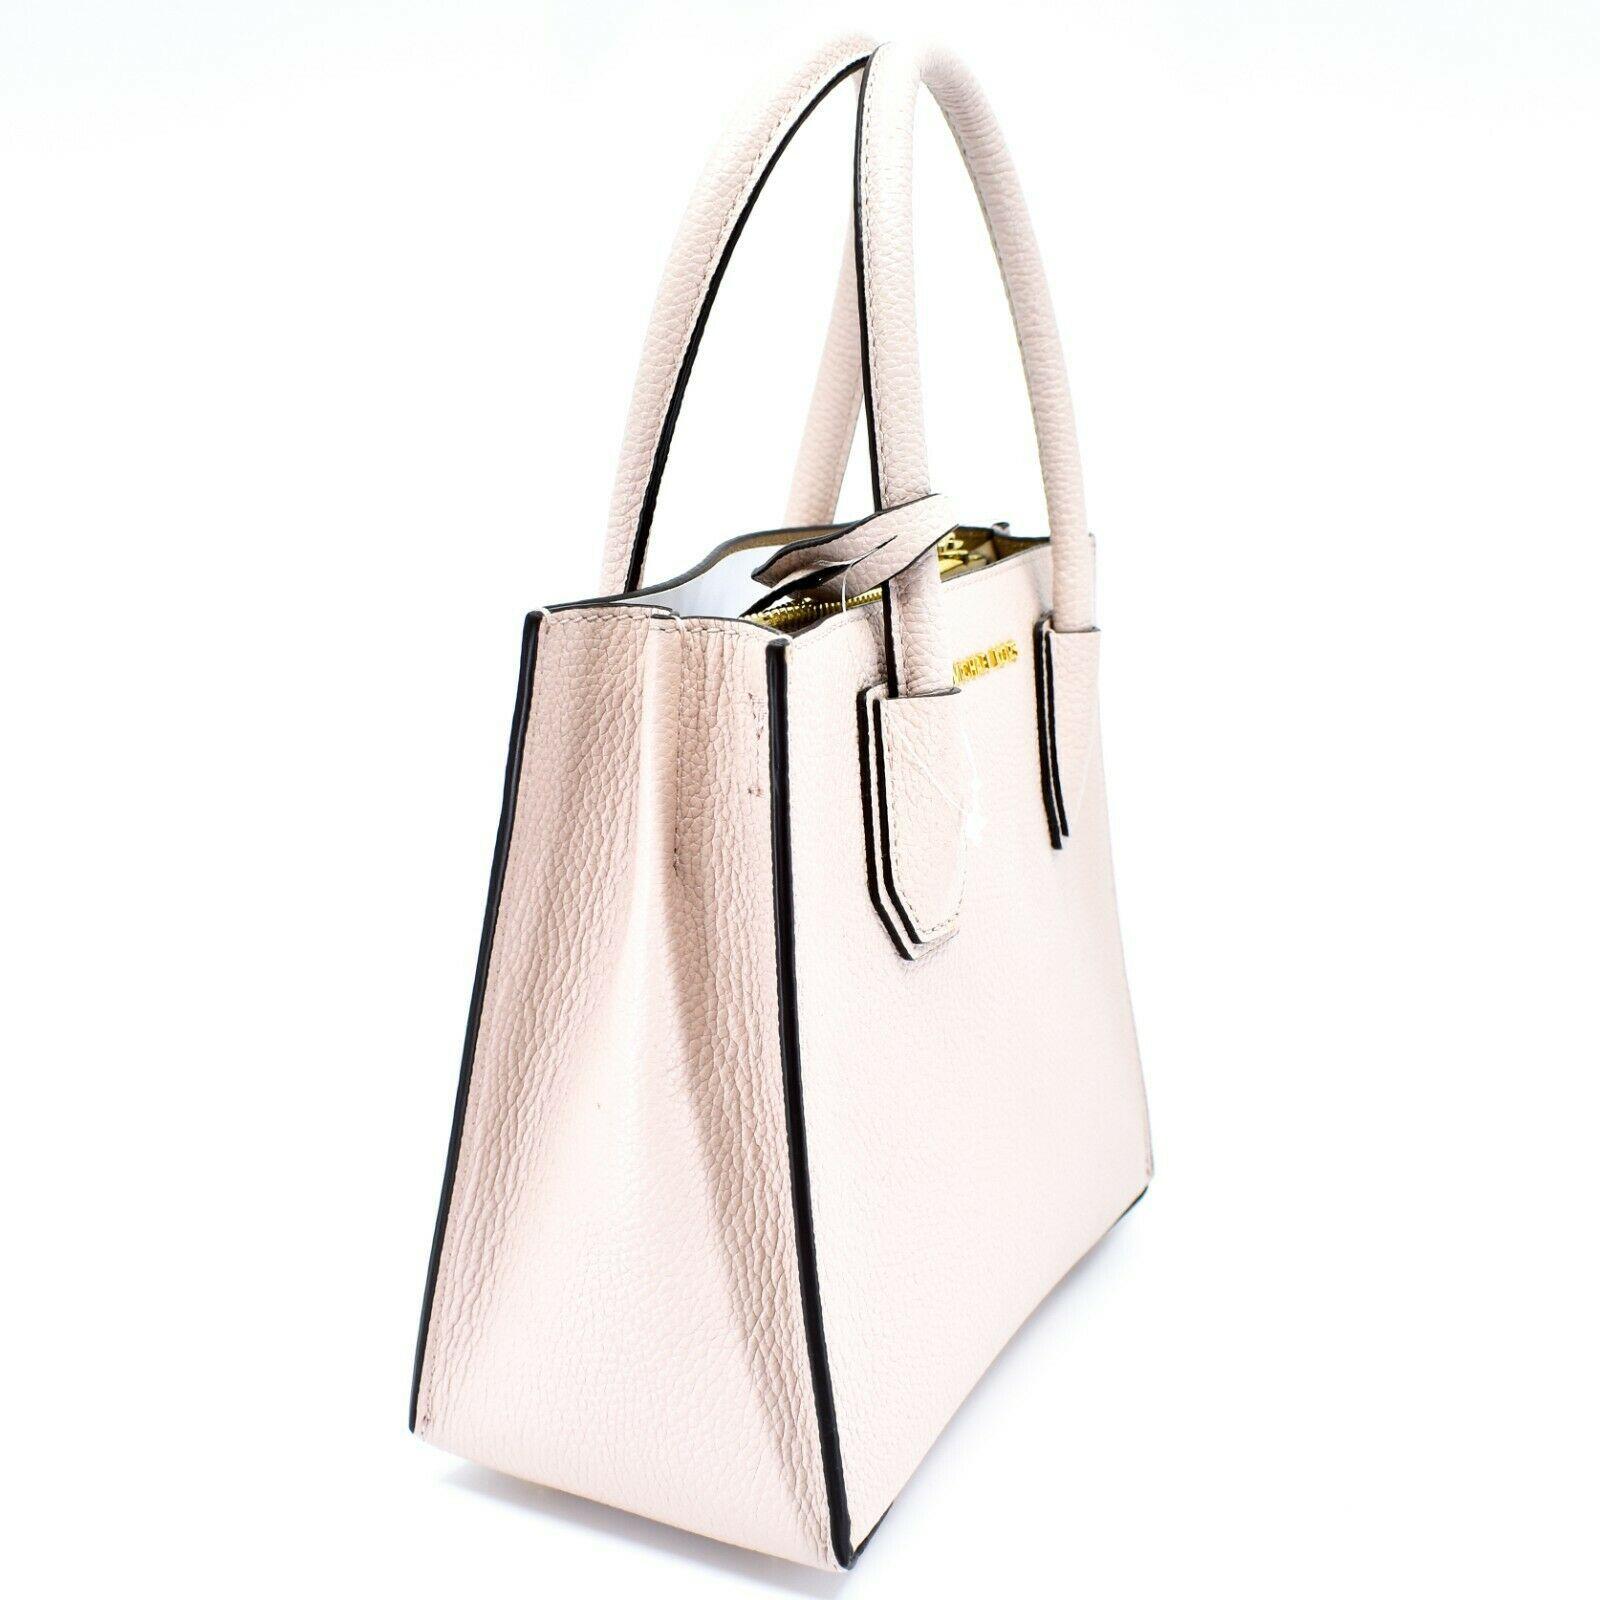 Michael Kors Mercer Soft Pink Pebbled Leather Medium Crossbody Messenger Bag image 4